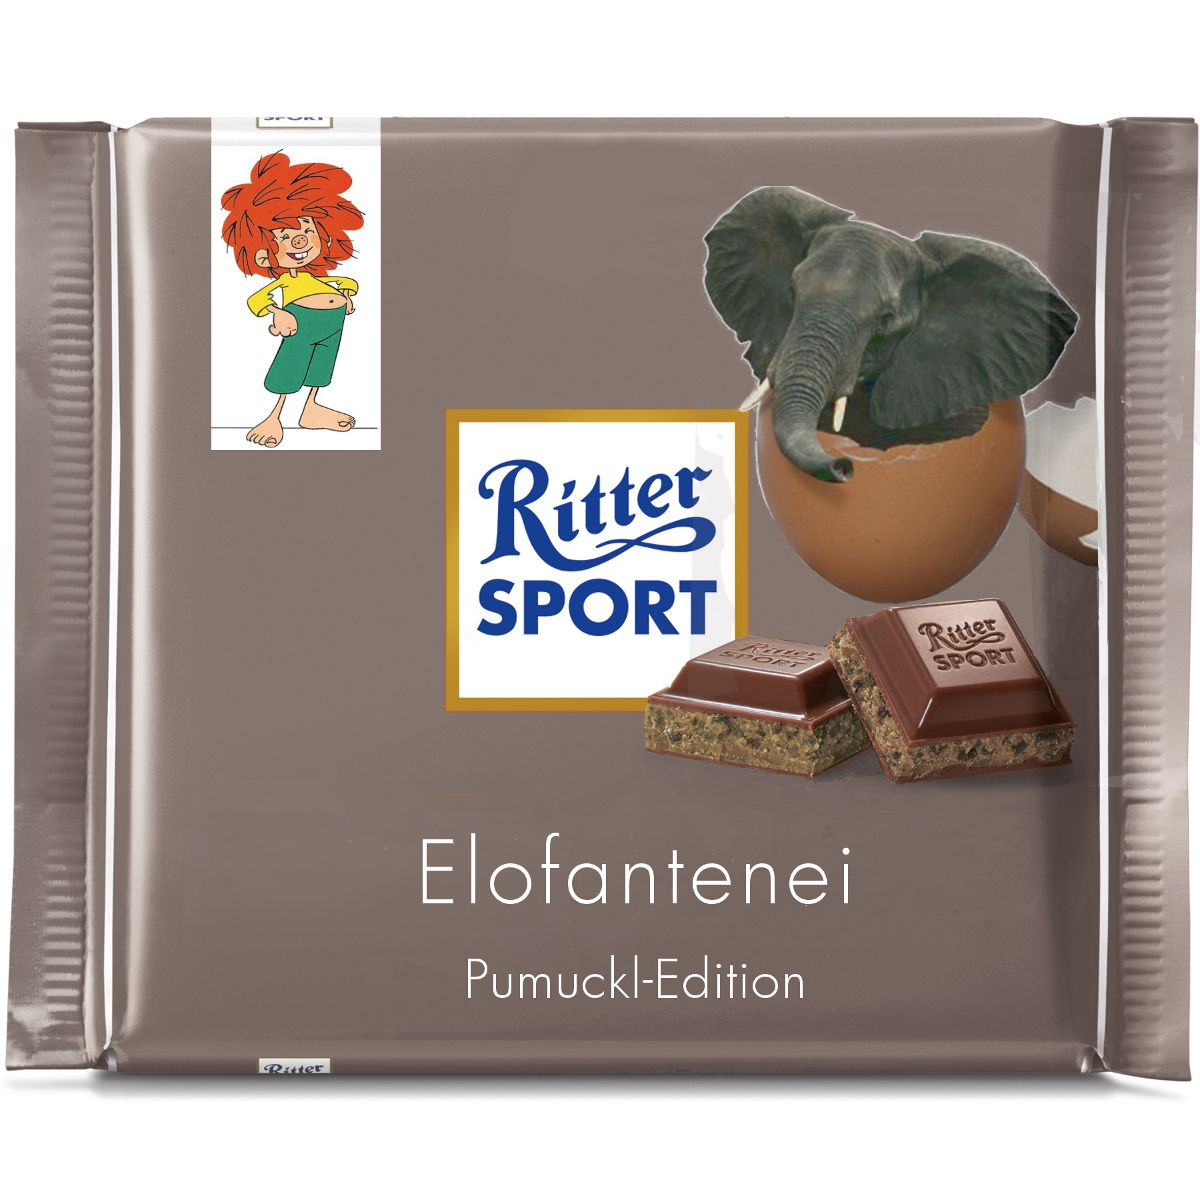 Schokolade Durchfall